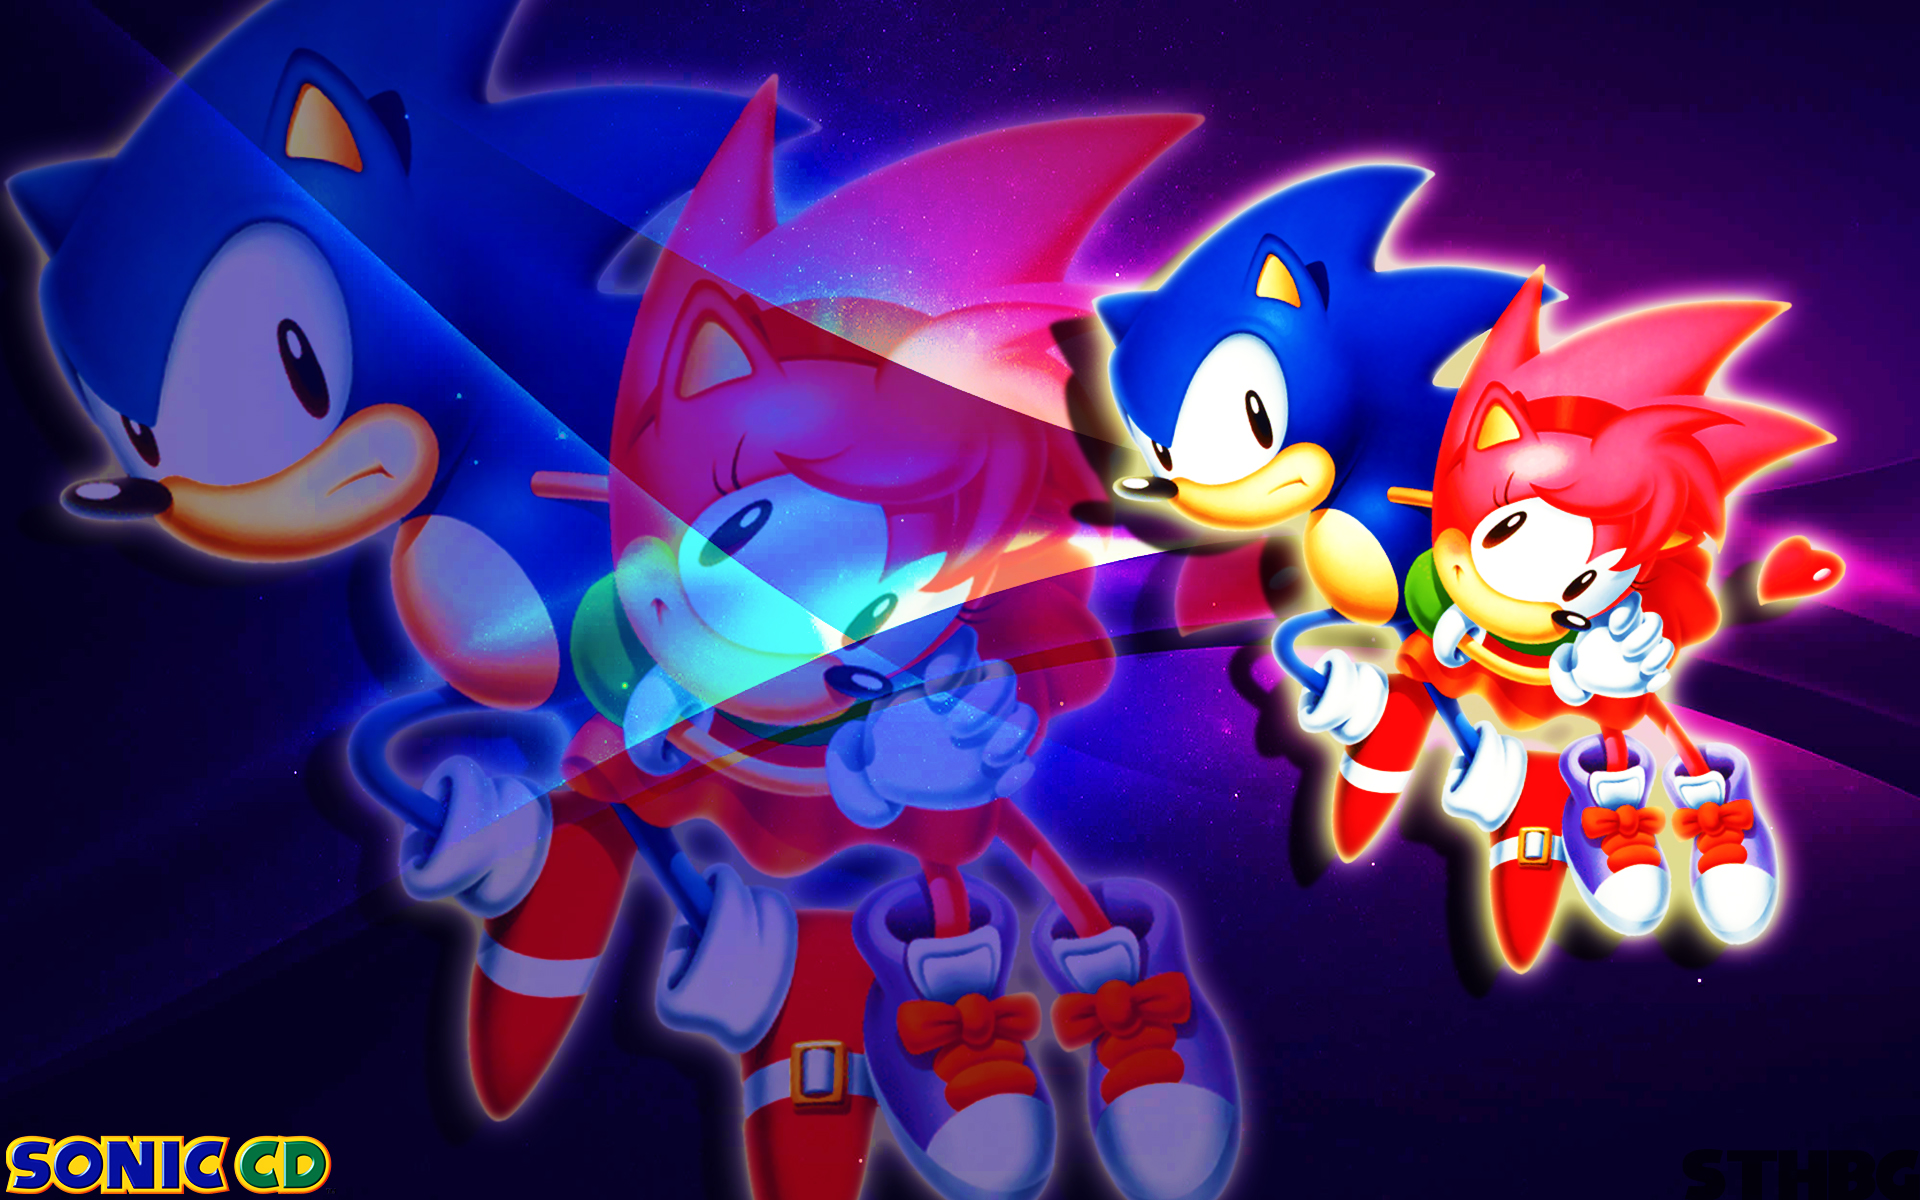 Sonic Cd Hd Wallpaper Background Image 1920x1200 Id